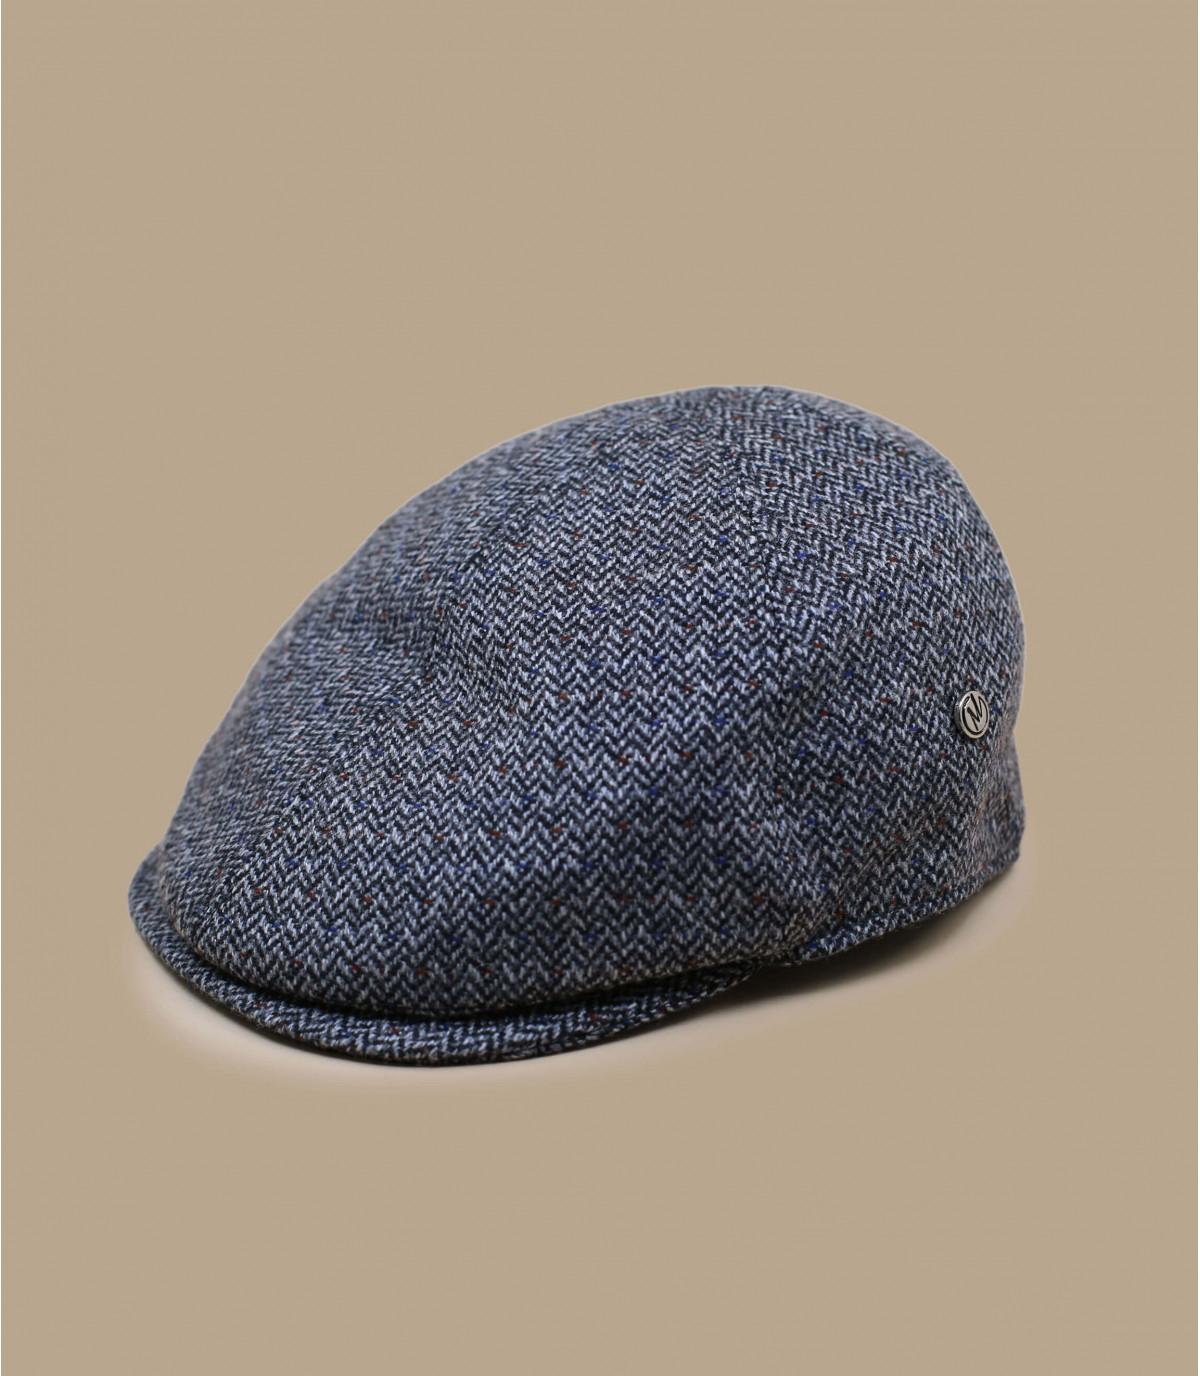 Barett-Cap grau Wolle Kaschmir